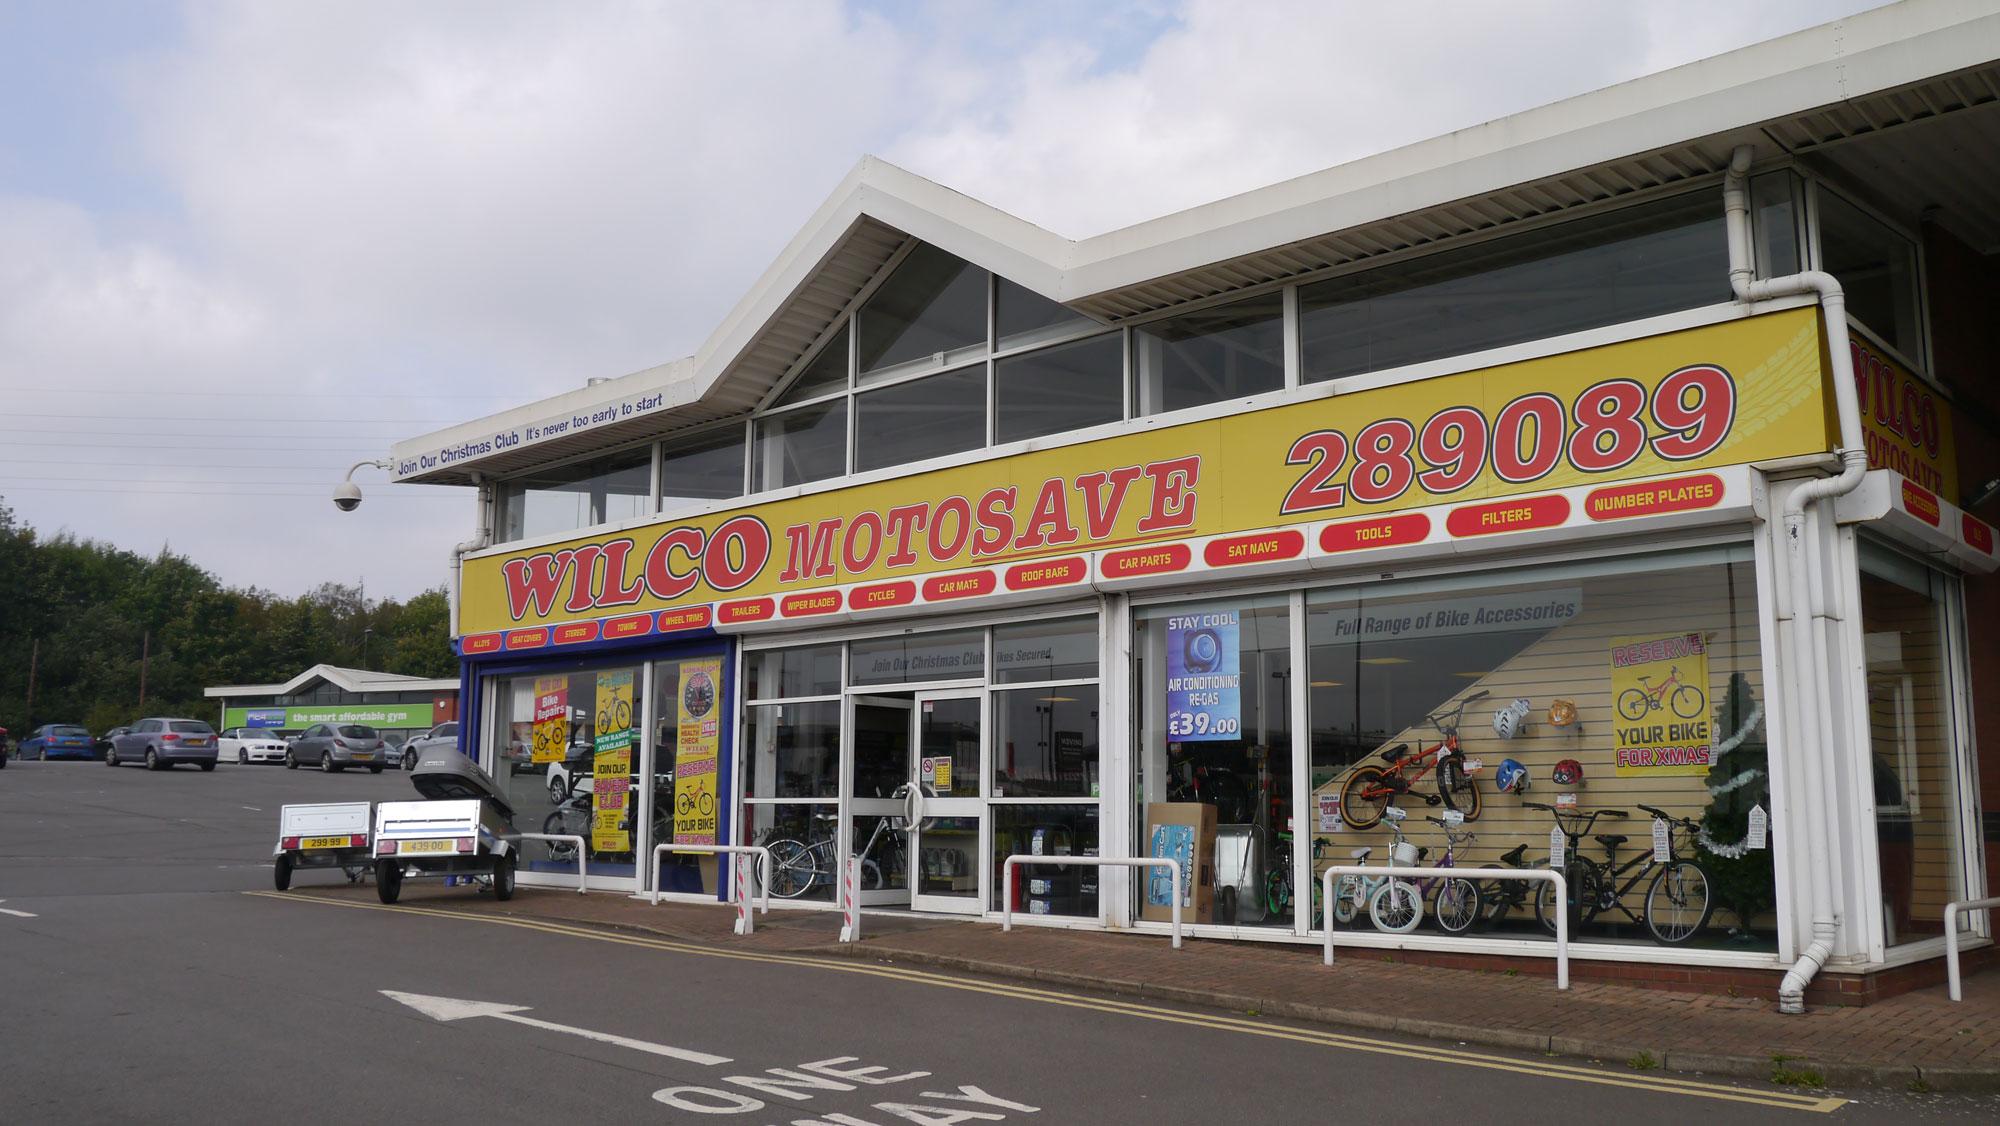 Wilco Motosave - Scunthorpe, Lincolnshire DN15 8XF - 01724 289089 | ShowMeLocal.com